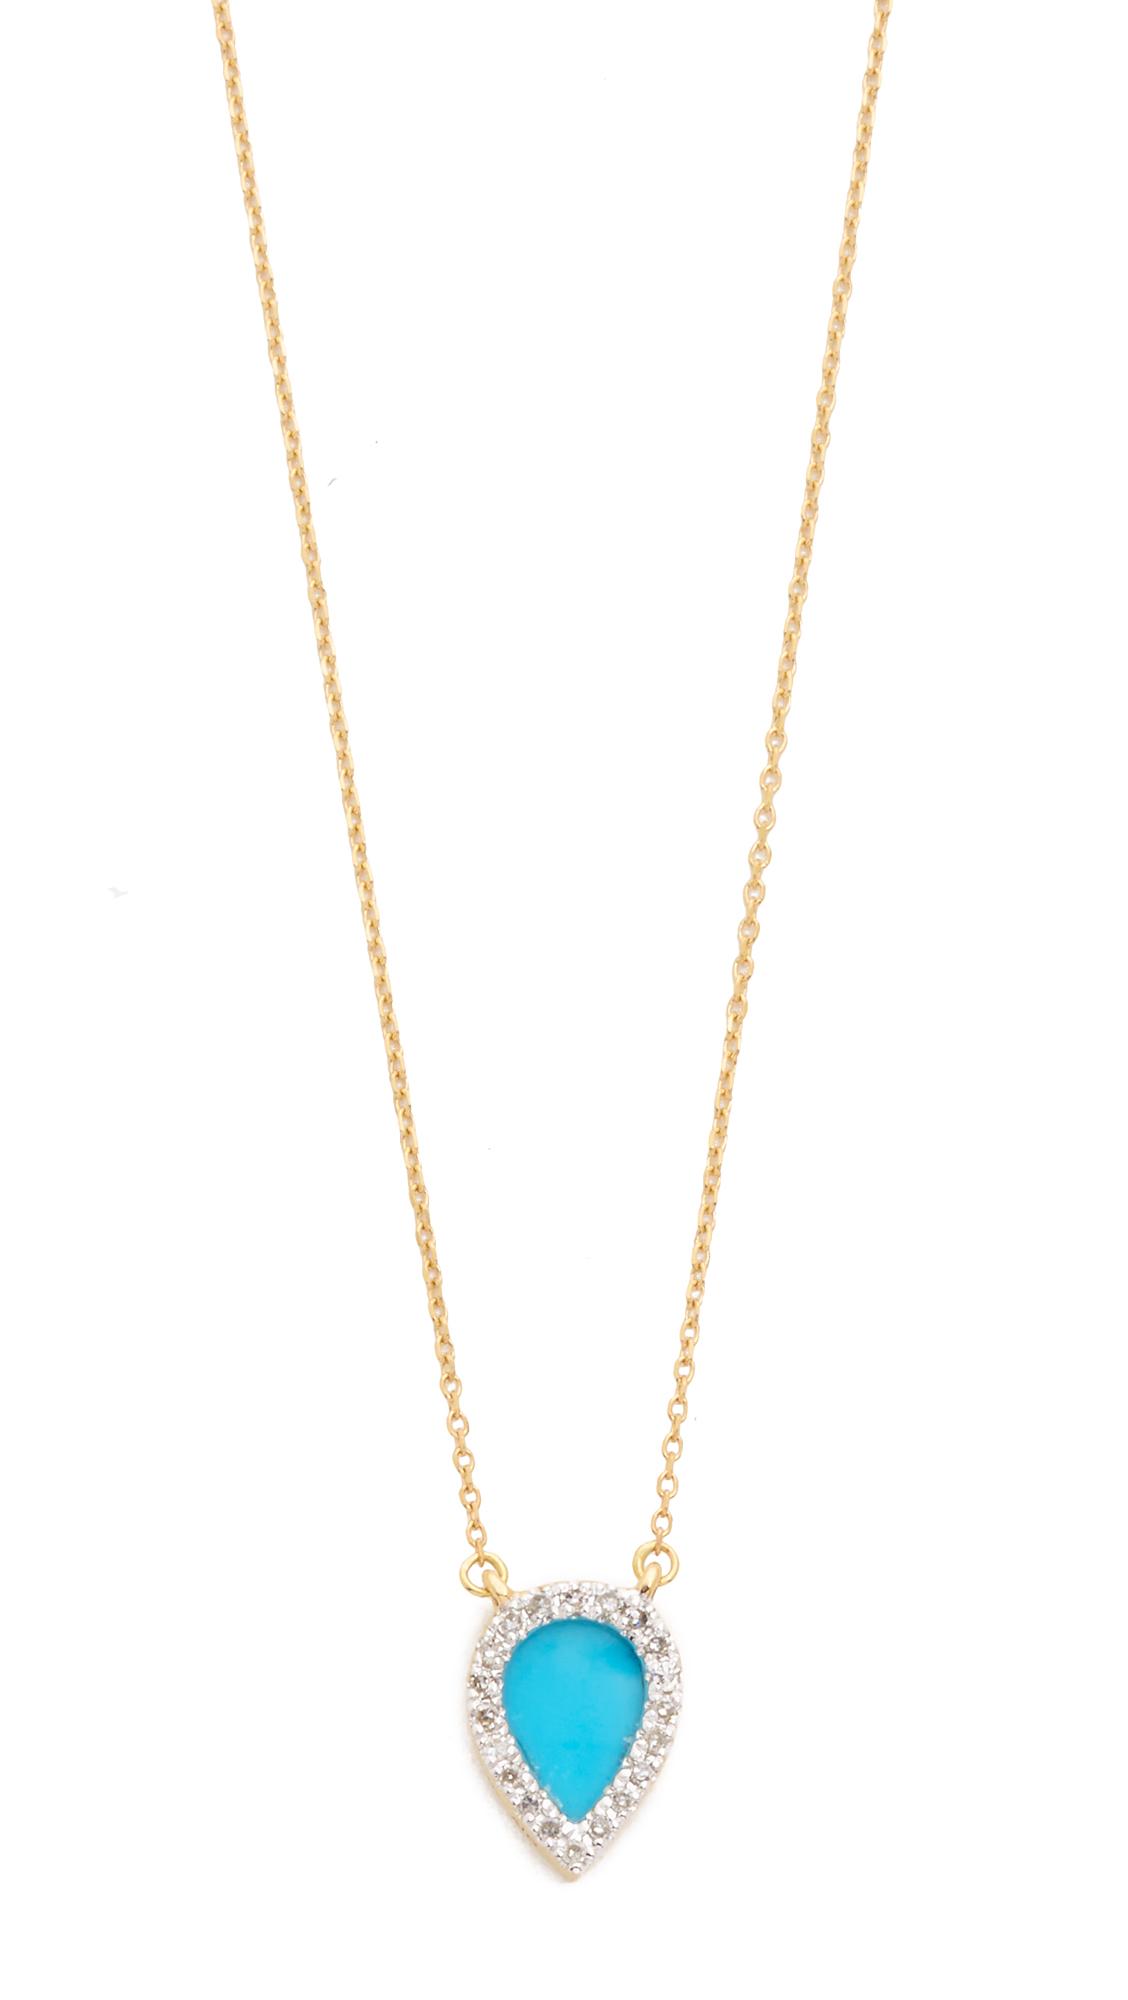 Adina Reyter 14k Gold Small Turquoise + Diamond Teardrop Pendant Necklace - Gold/Turquoise